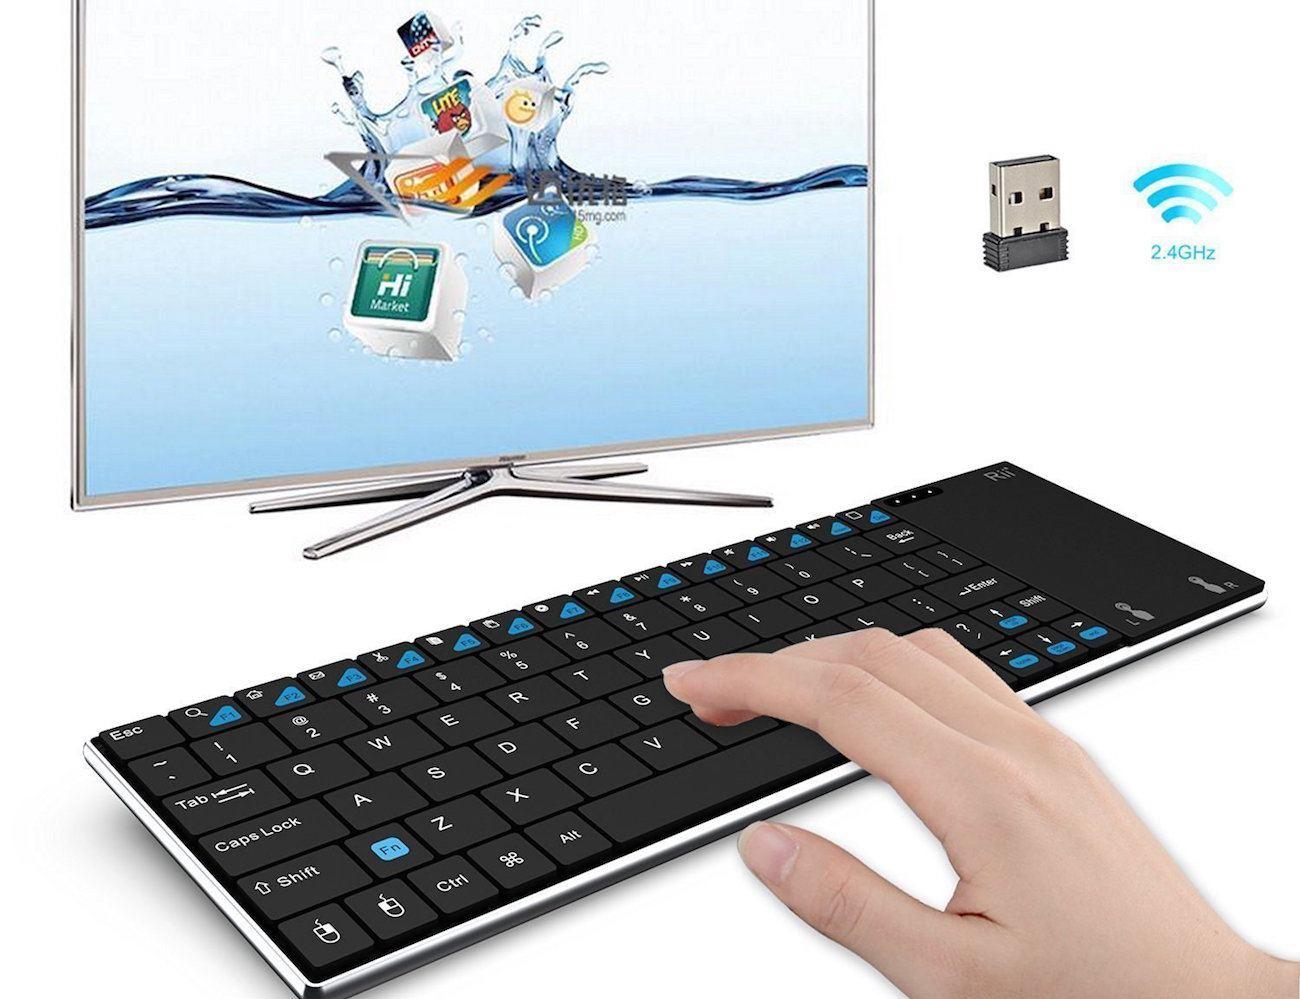 rii wireless handheld stainless keyboard gadget flow. Black Bedroom Furniture Sets. Home Design Ideas